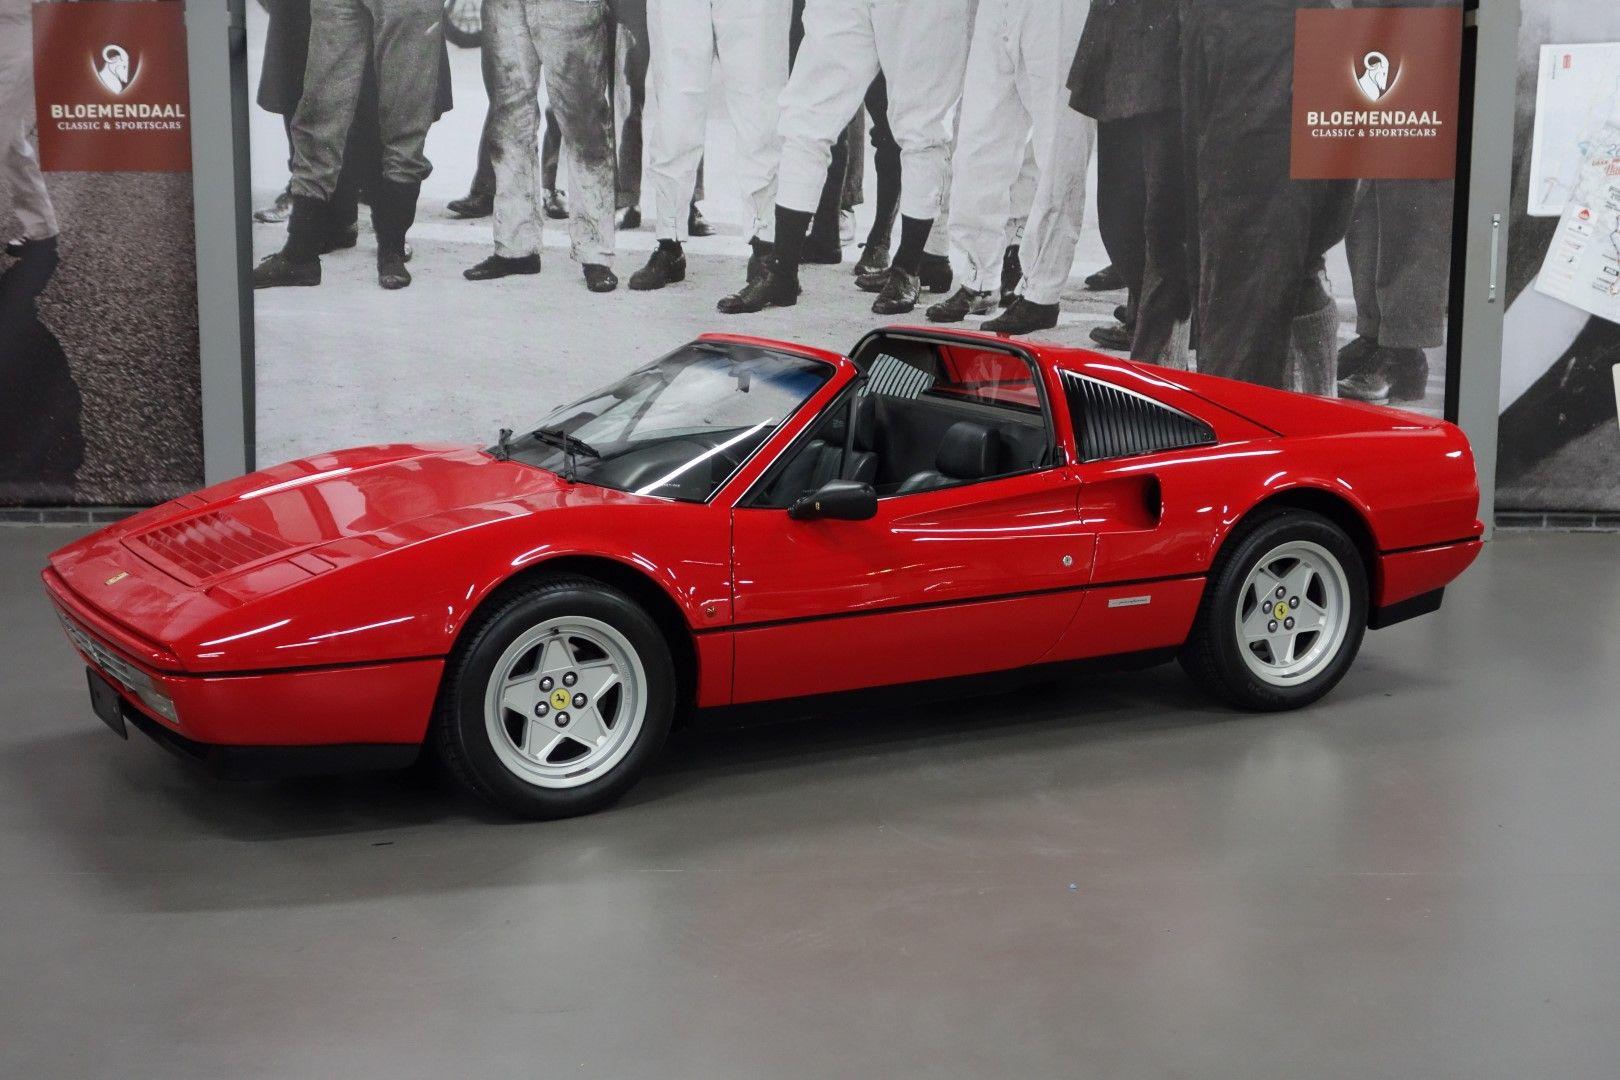 The fabulous ferrari 458 ferrari 328 ferrari and cars ferrari 328 gts quattrovalvole bloemendaal classic sportscars vanachro Image collections